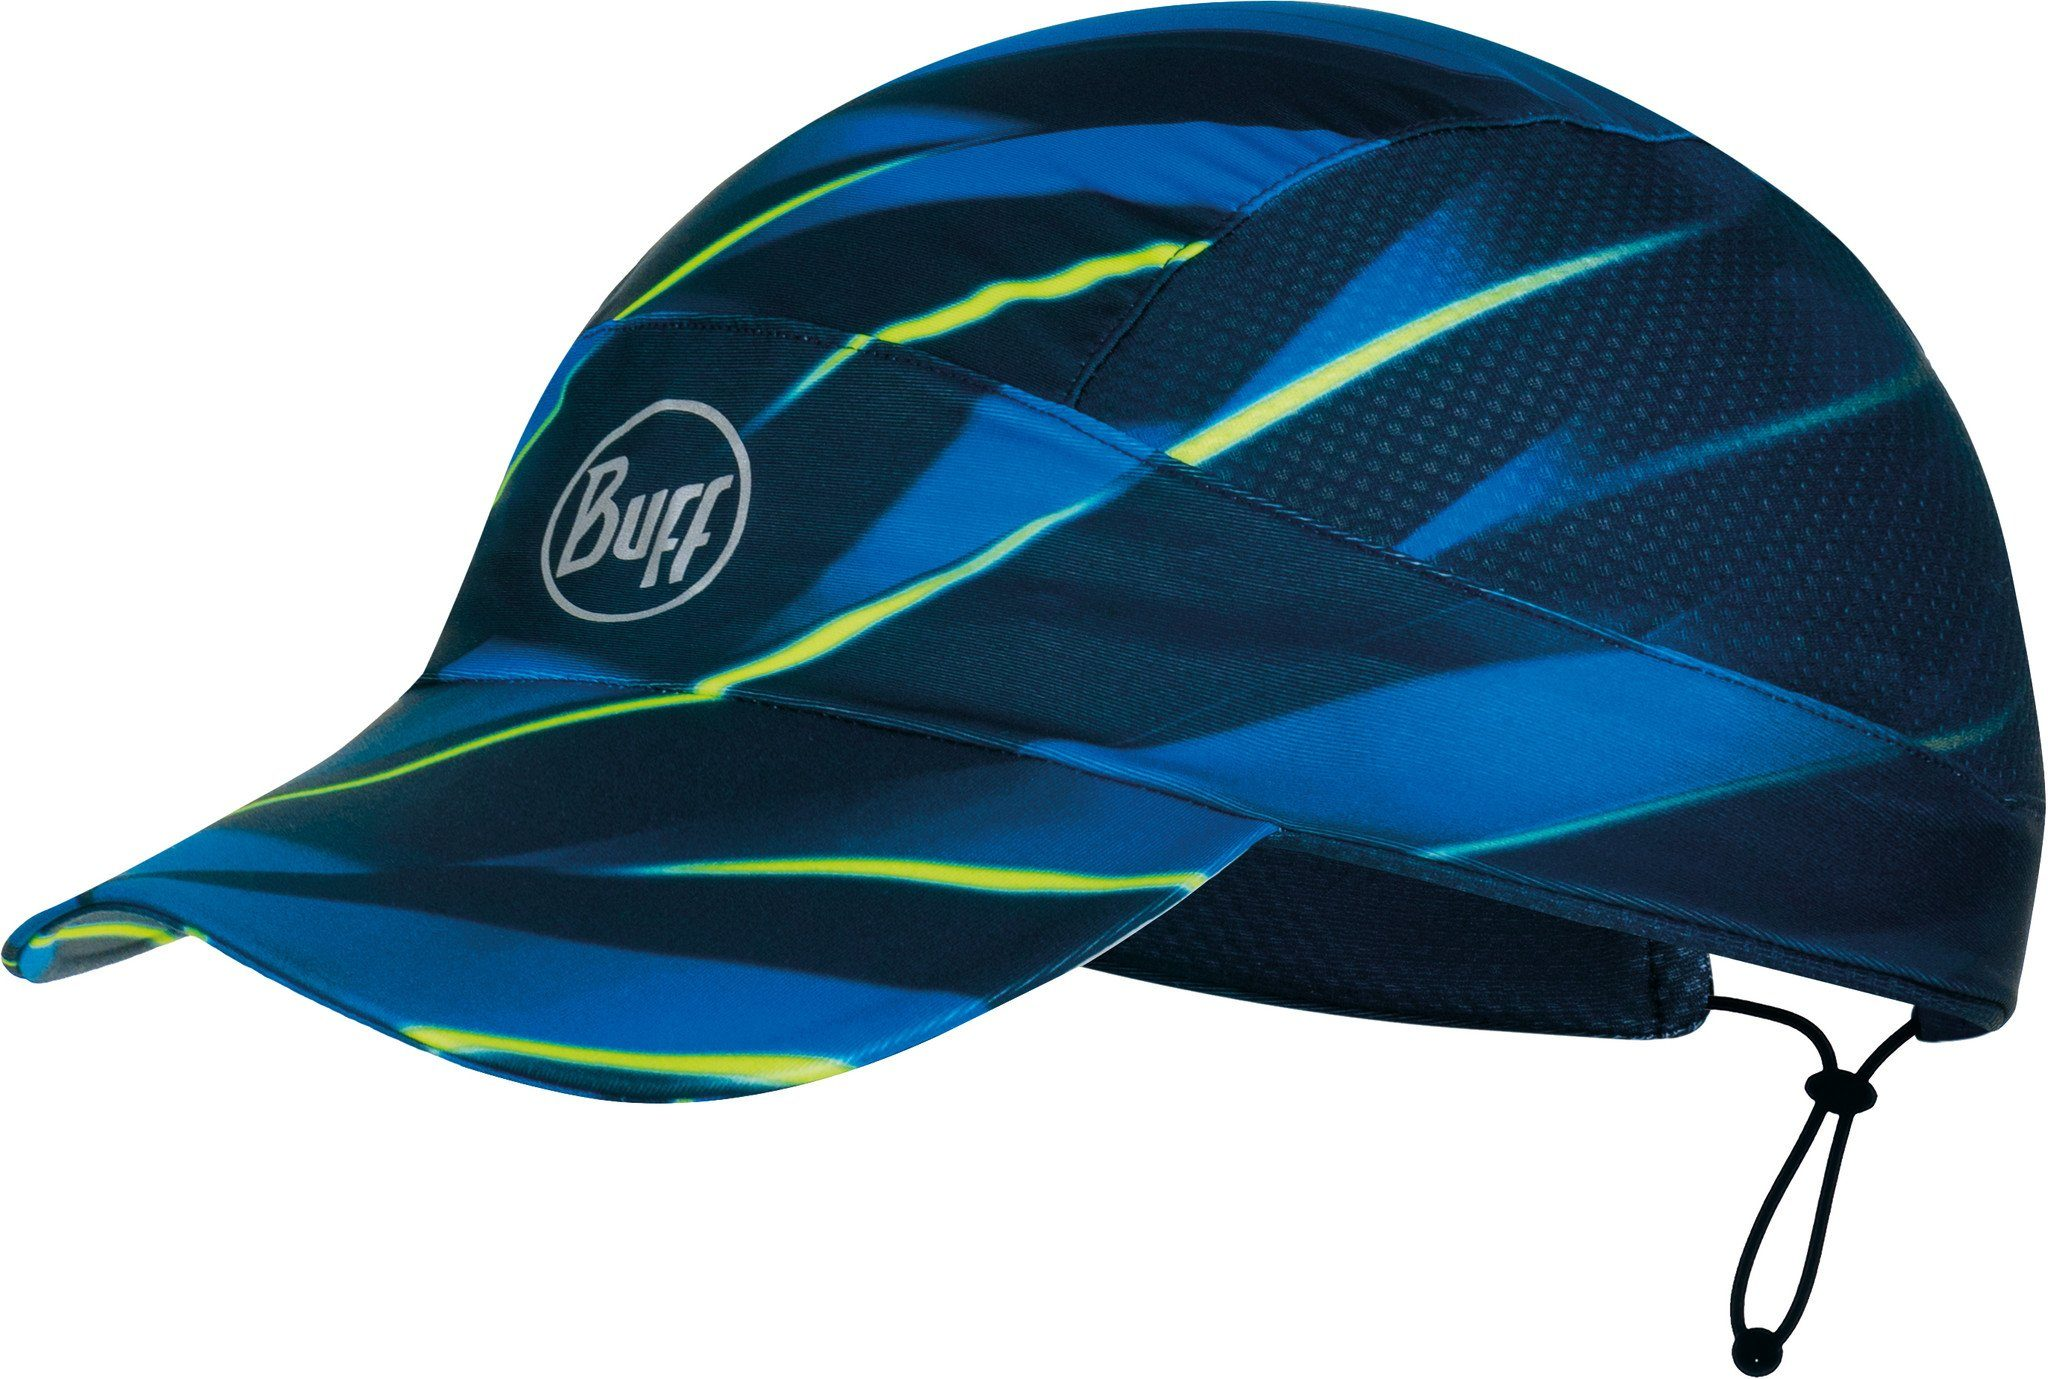 Kaufen »pack Run Online Cap« Hut Buff EYDI9HW2